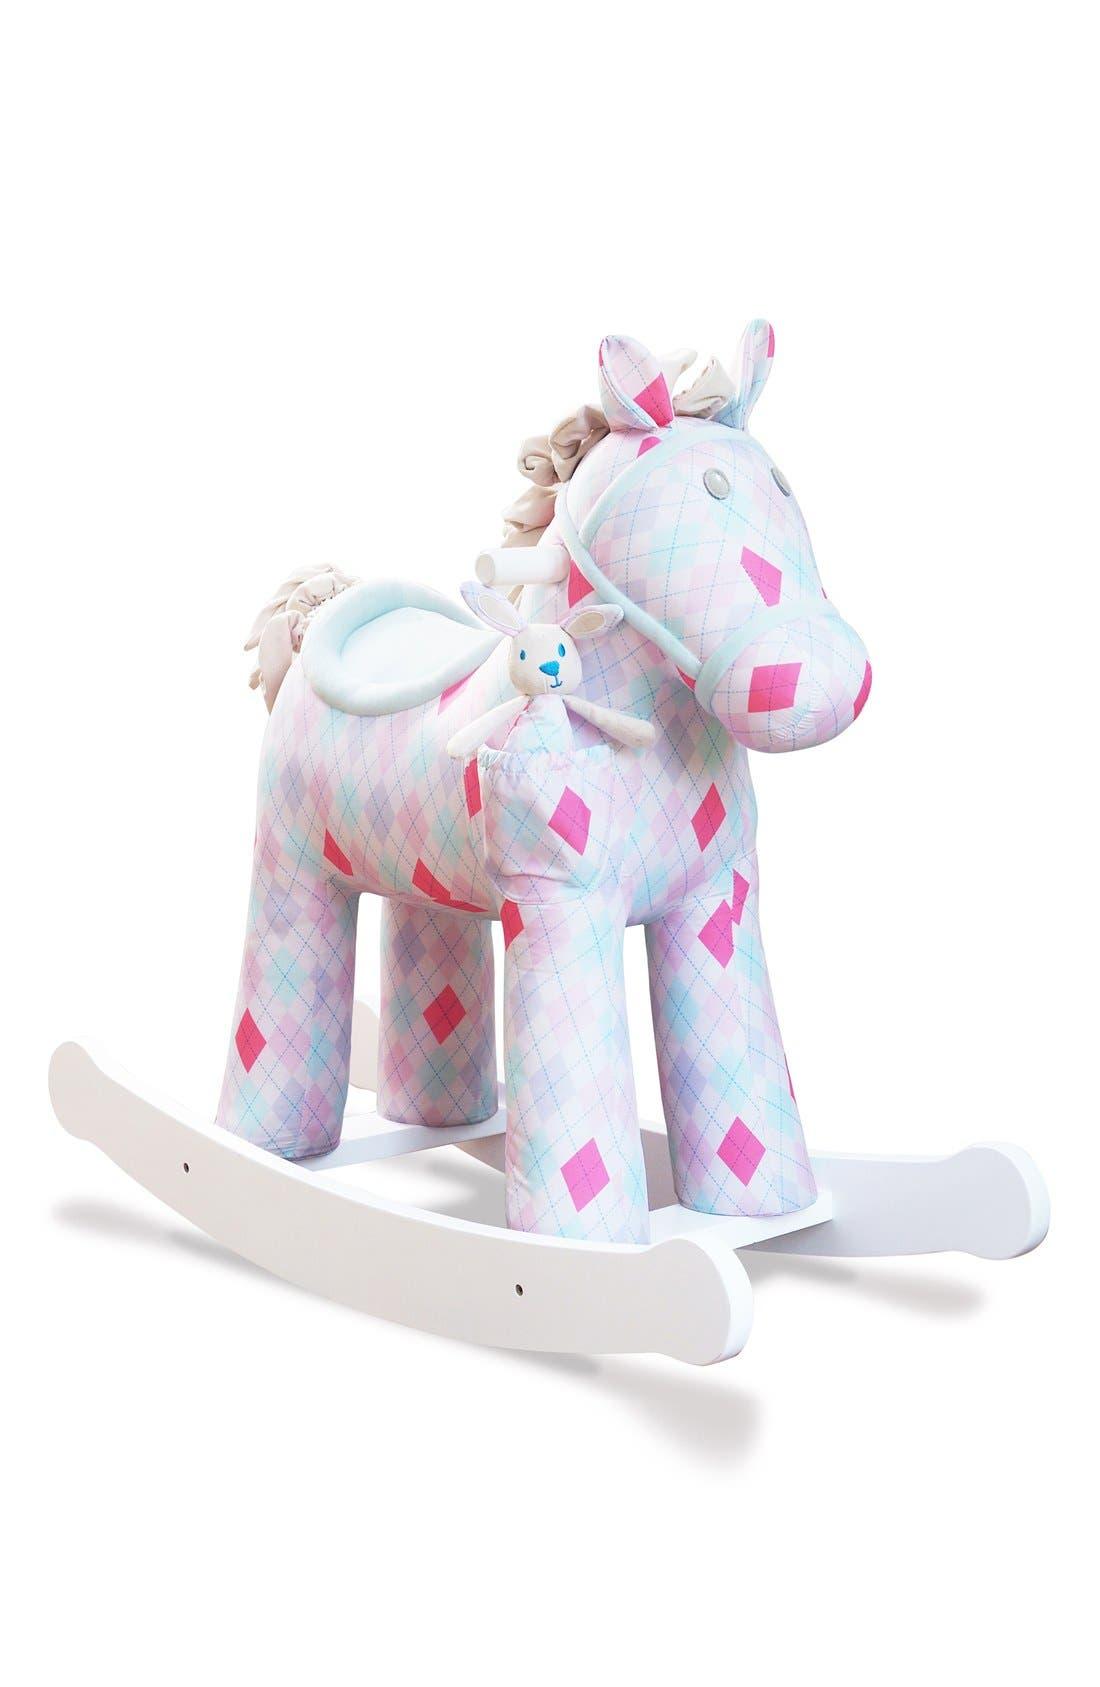 Little Bird Told Me Florence & Floop Rocking Horse & Stuffed Animal